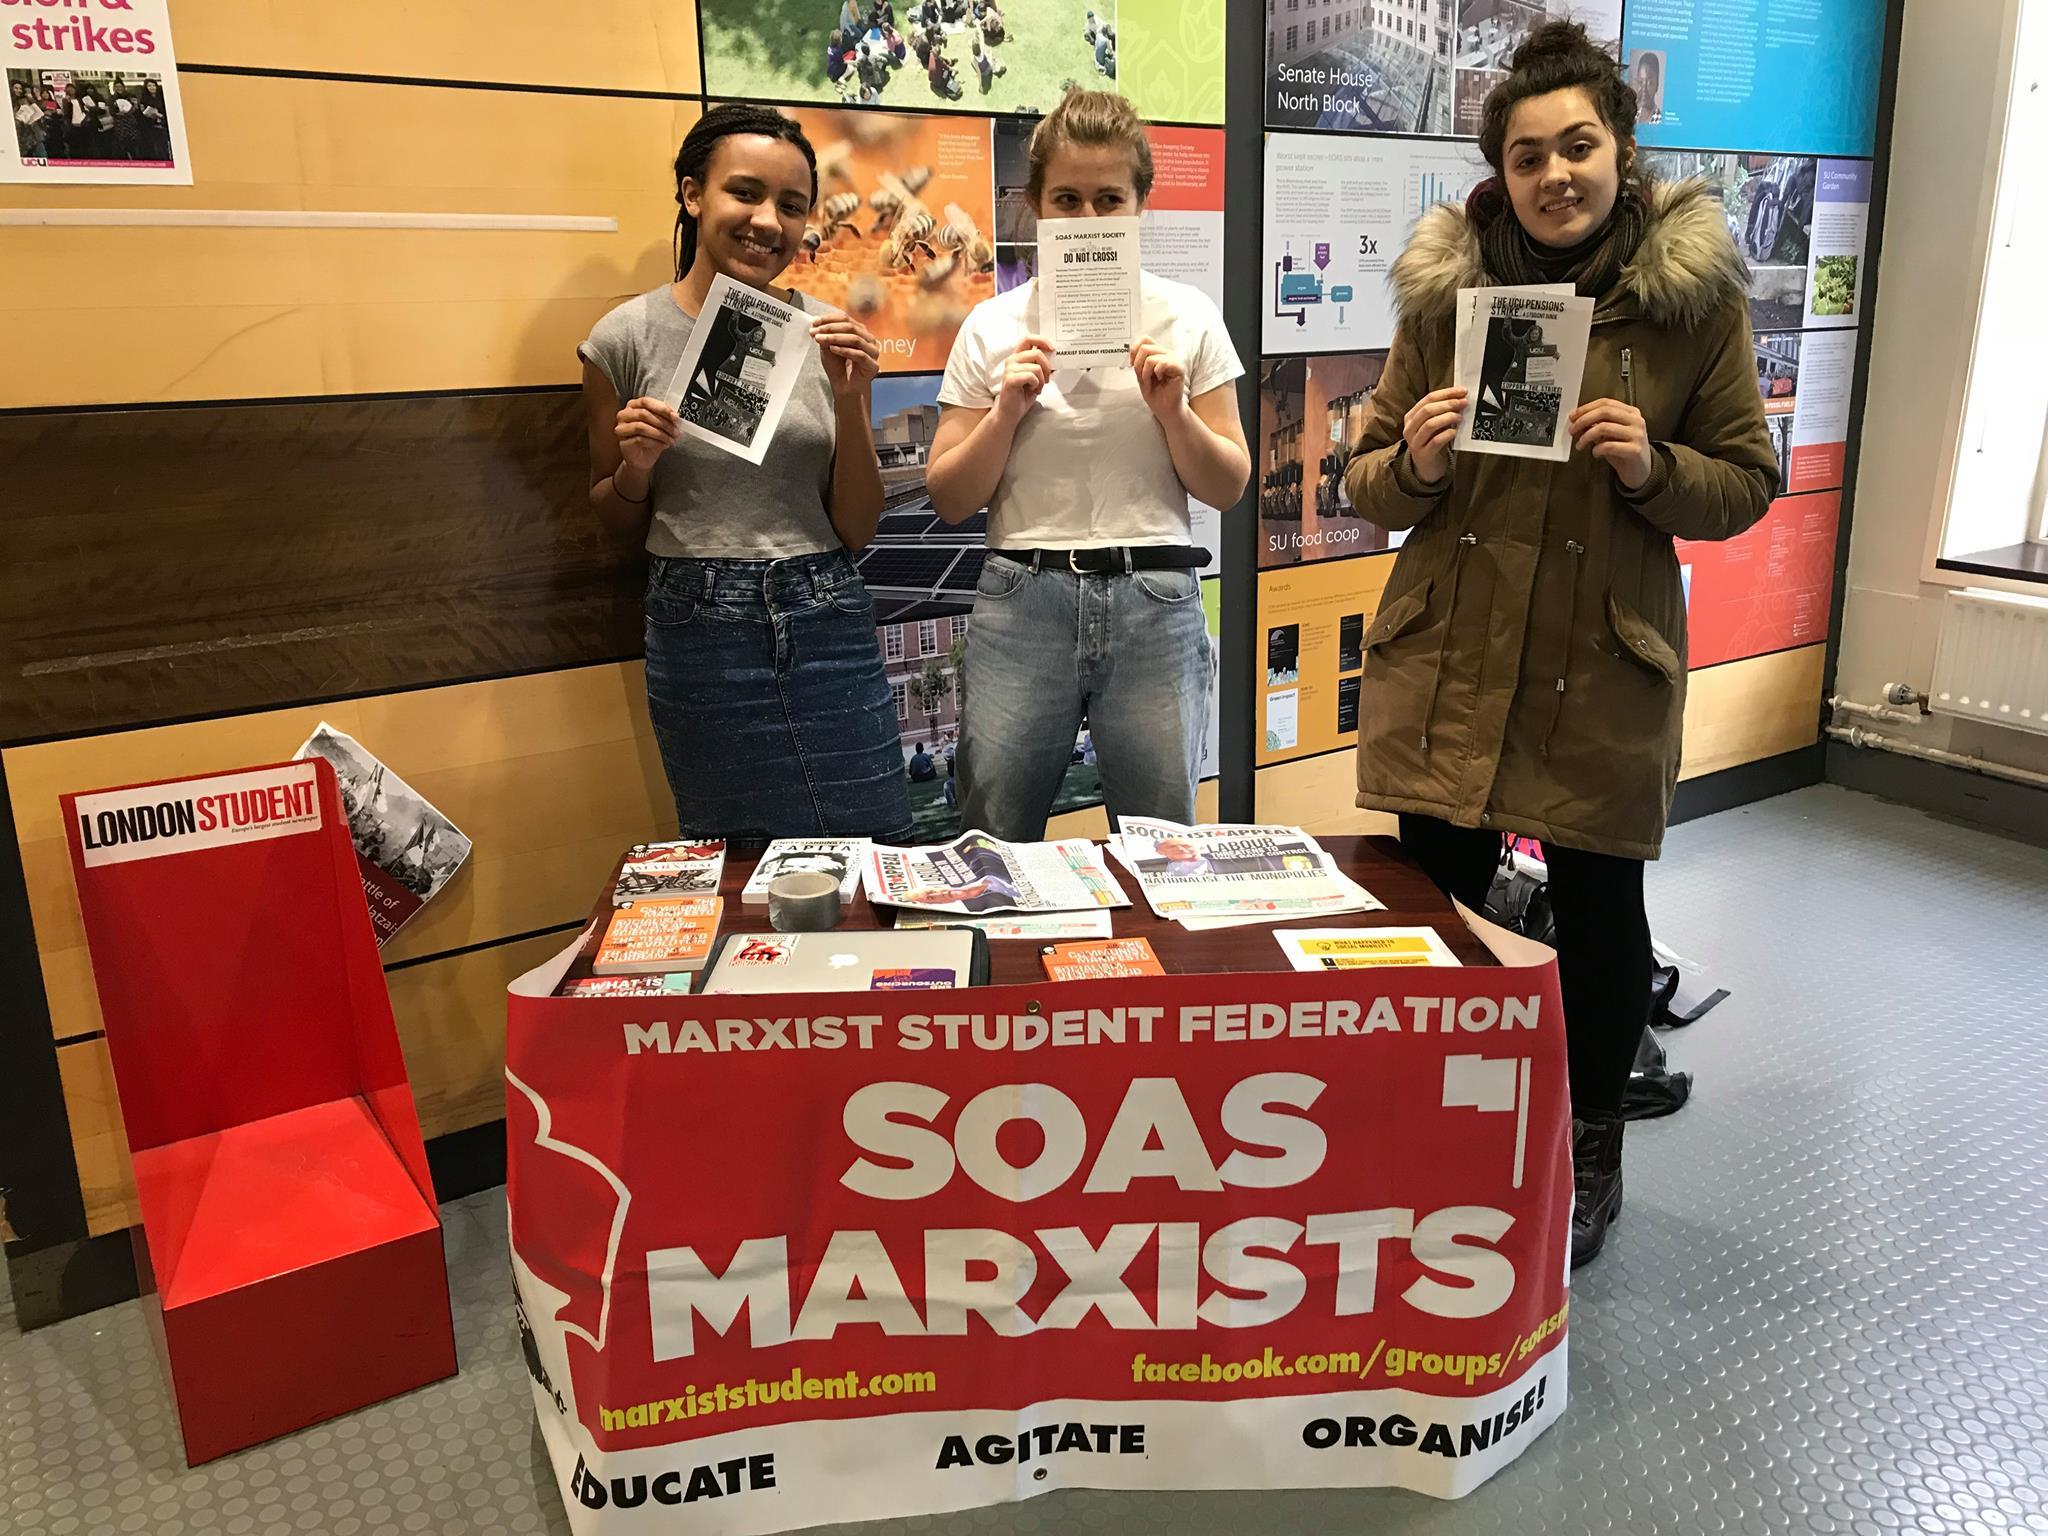 SOAS Marxists